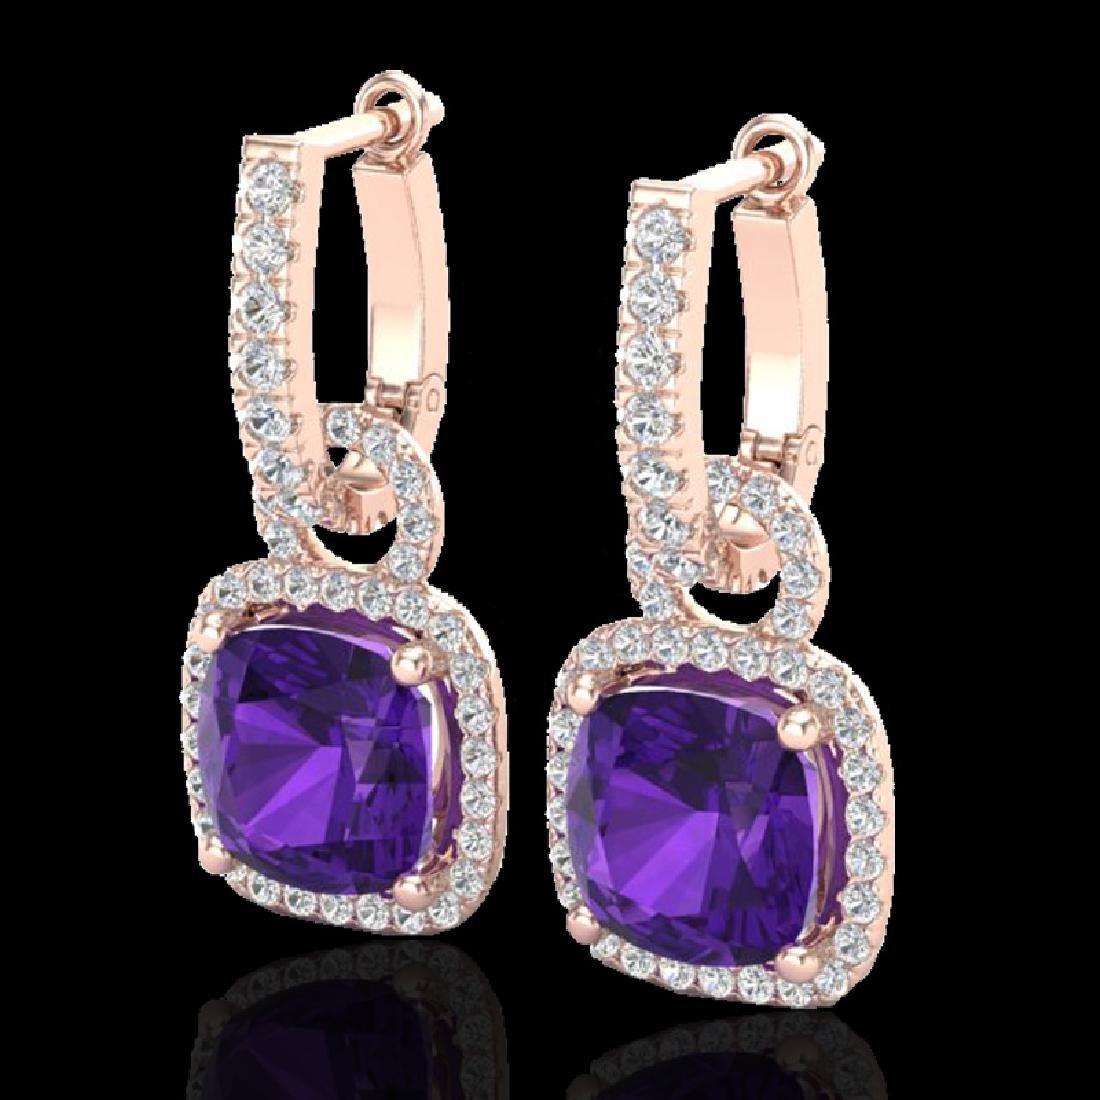 7 CTW Amethyst & Micro Pave VS/SI Diamond Earrings 14K